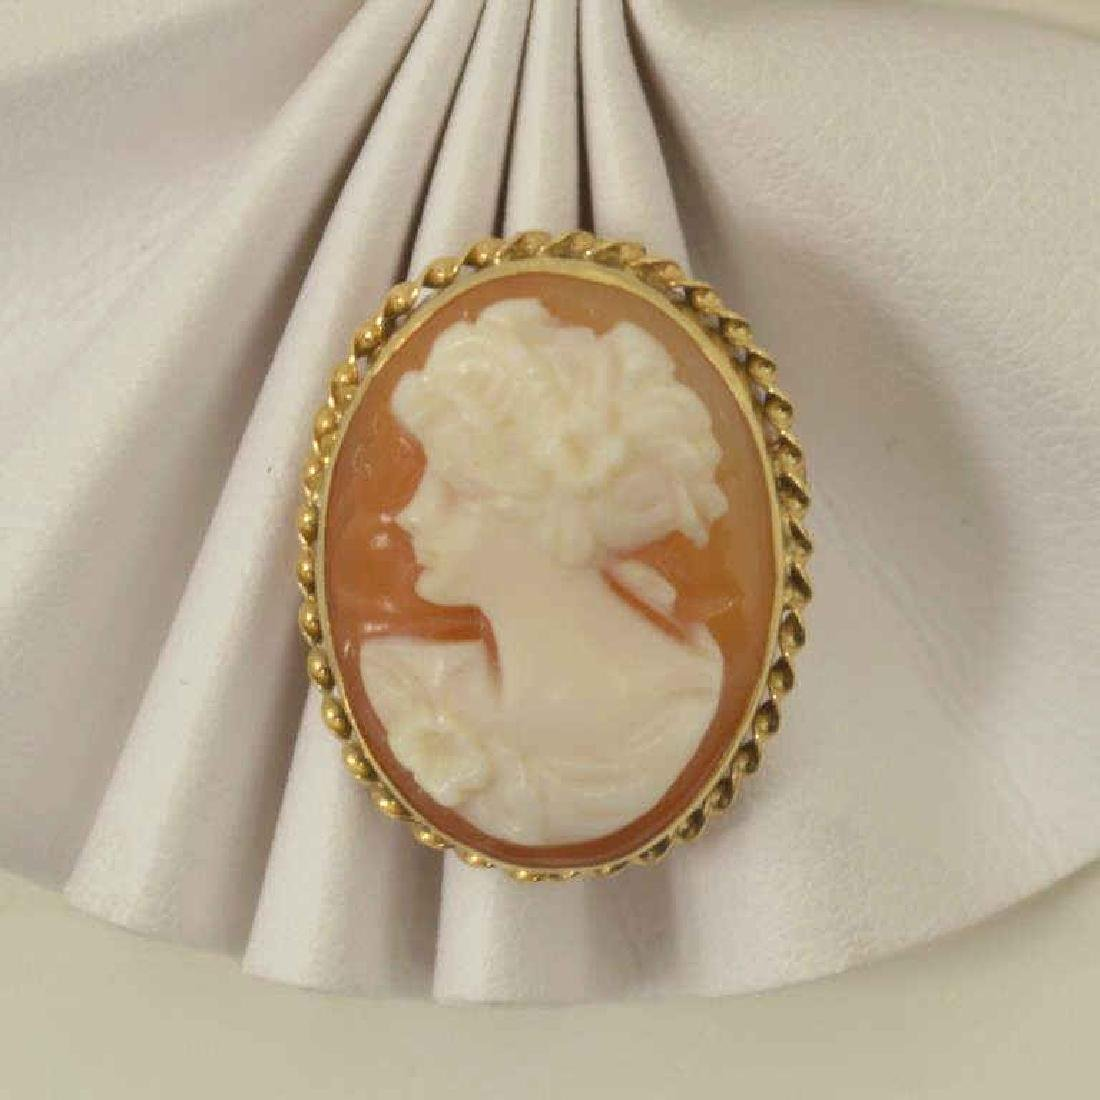 14kt yellow gold cameo pendant/ pin